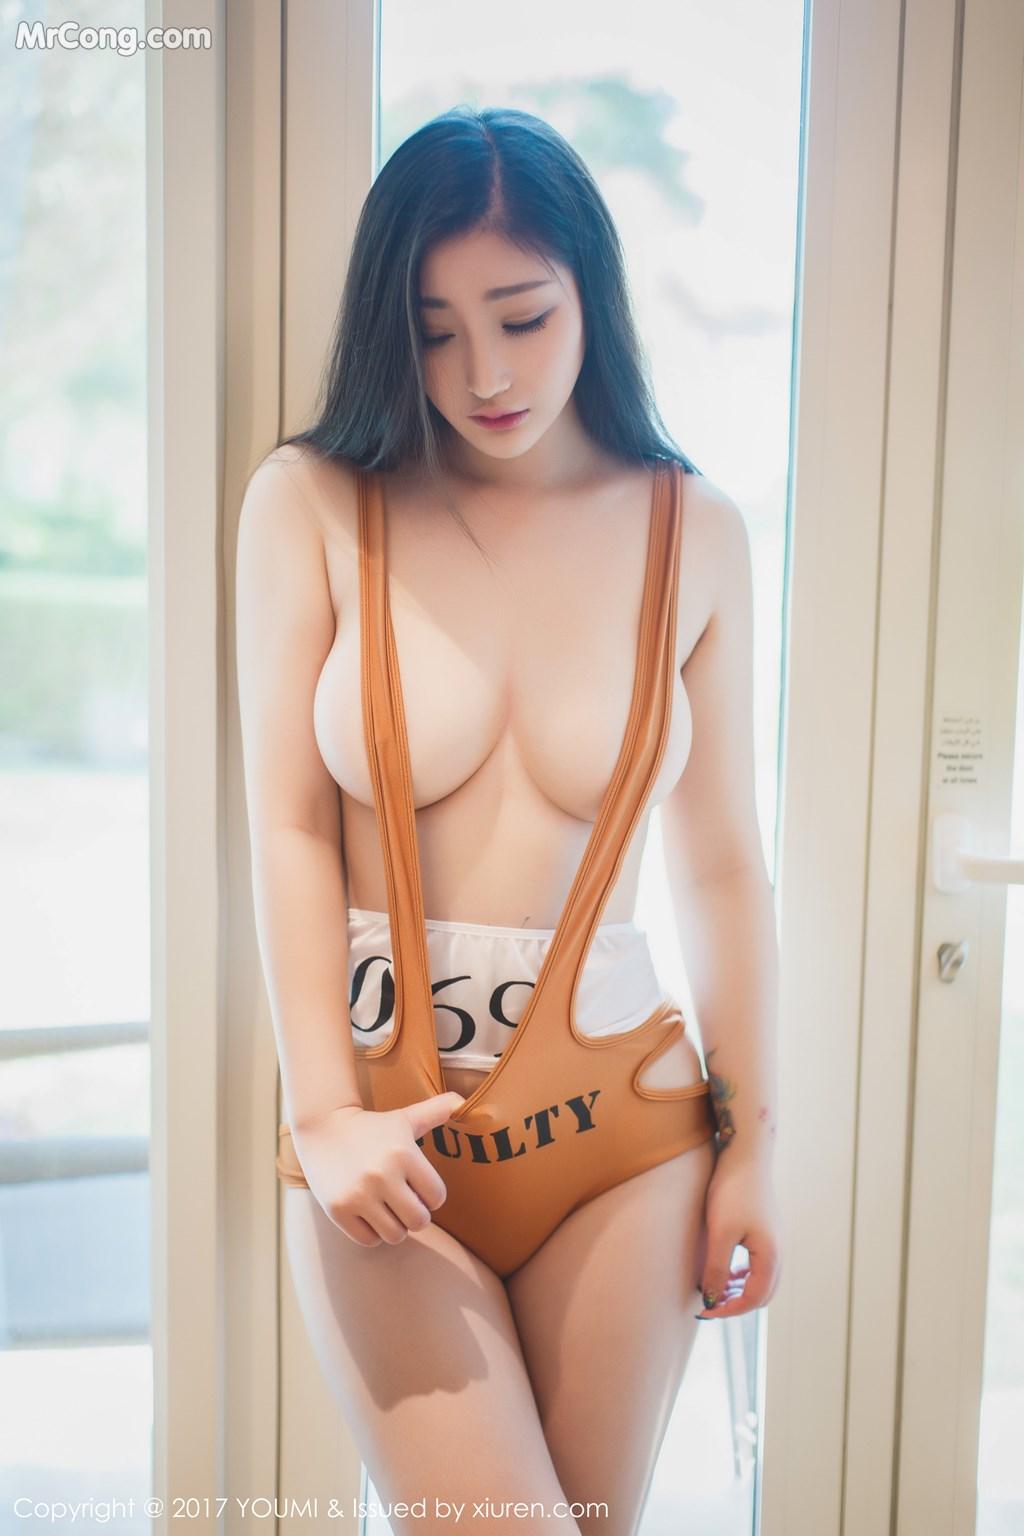 Image YouMi-Vol.077-Daji-Toxic-MrCong.com-014 in post YouMi Vol.077: Người mẫu Daji_Toxic (妲己_Toxic) (49 ảnh)